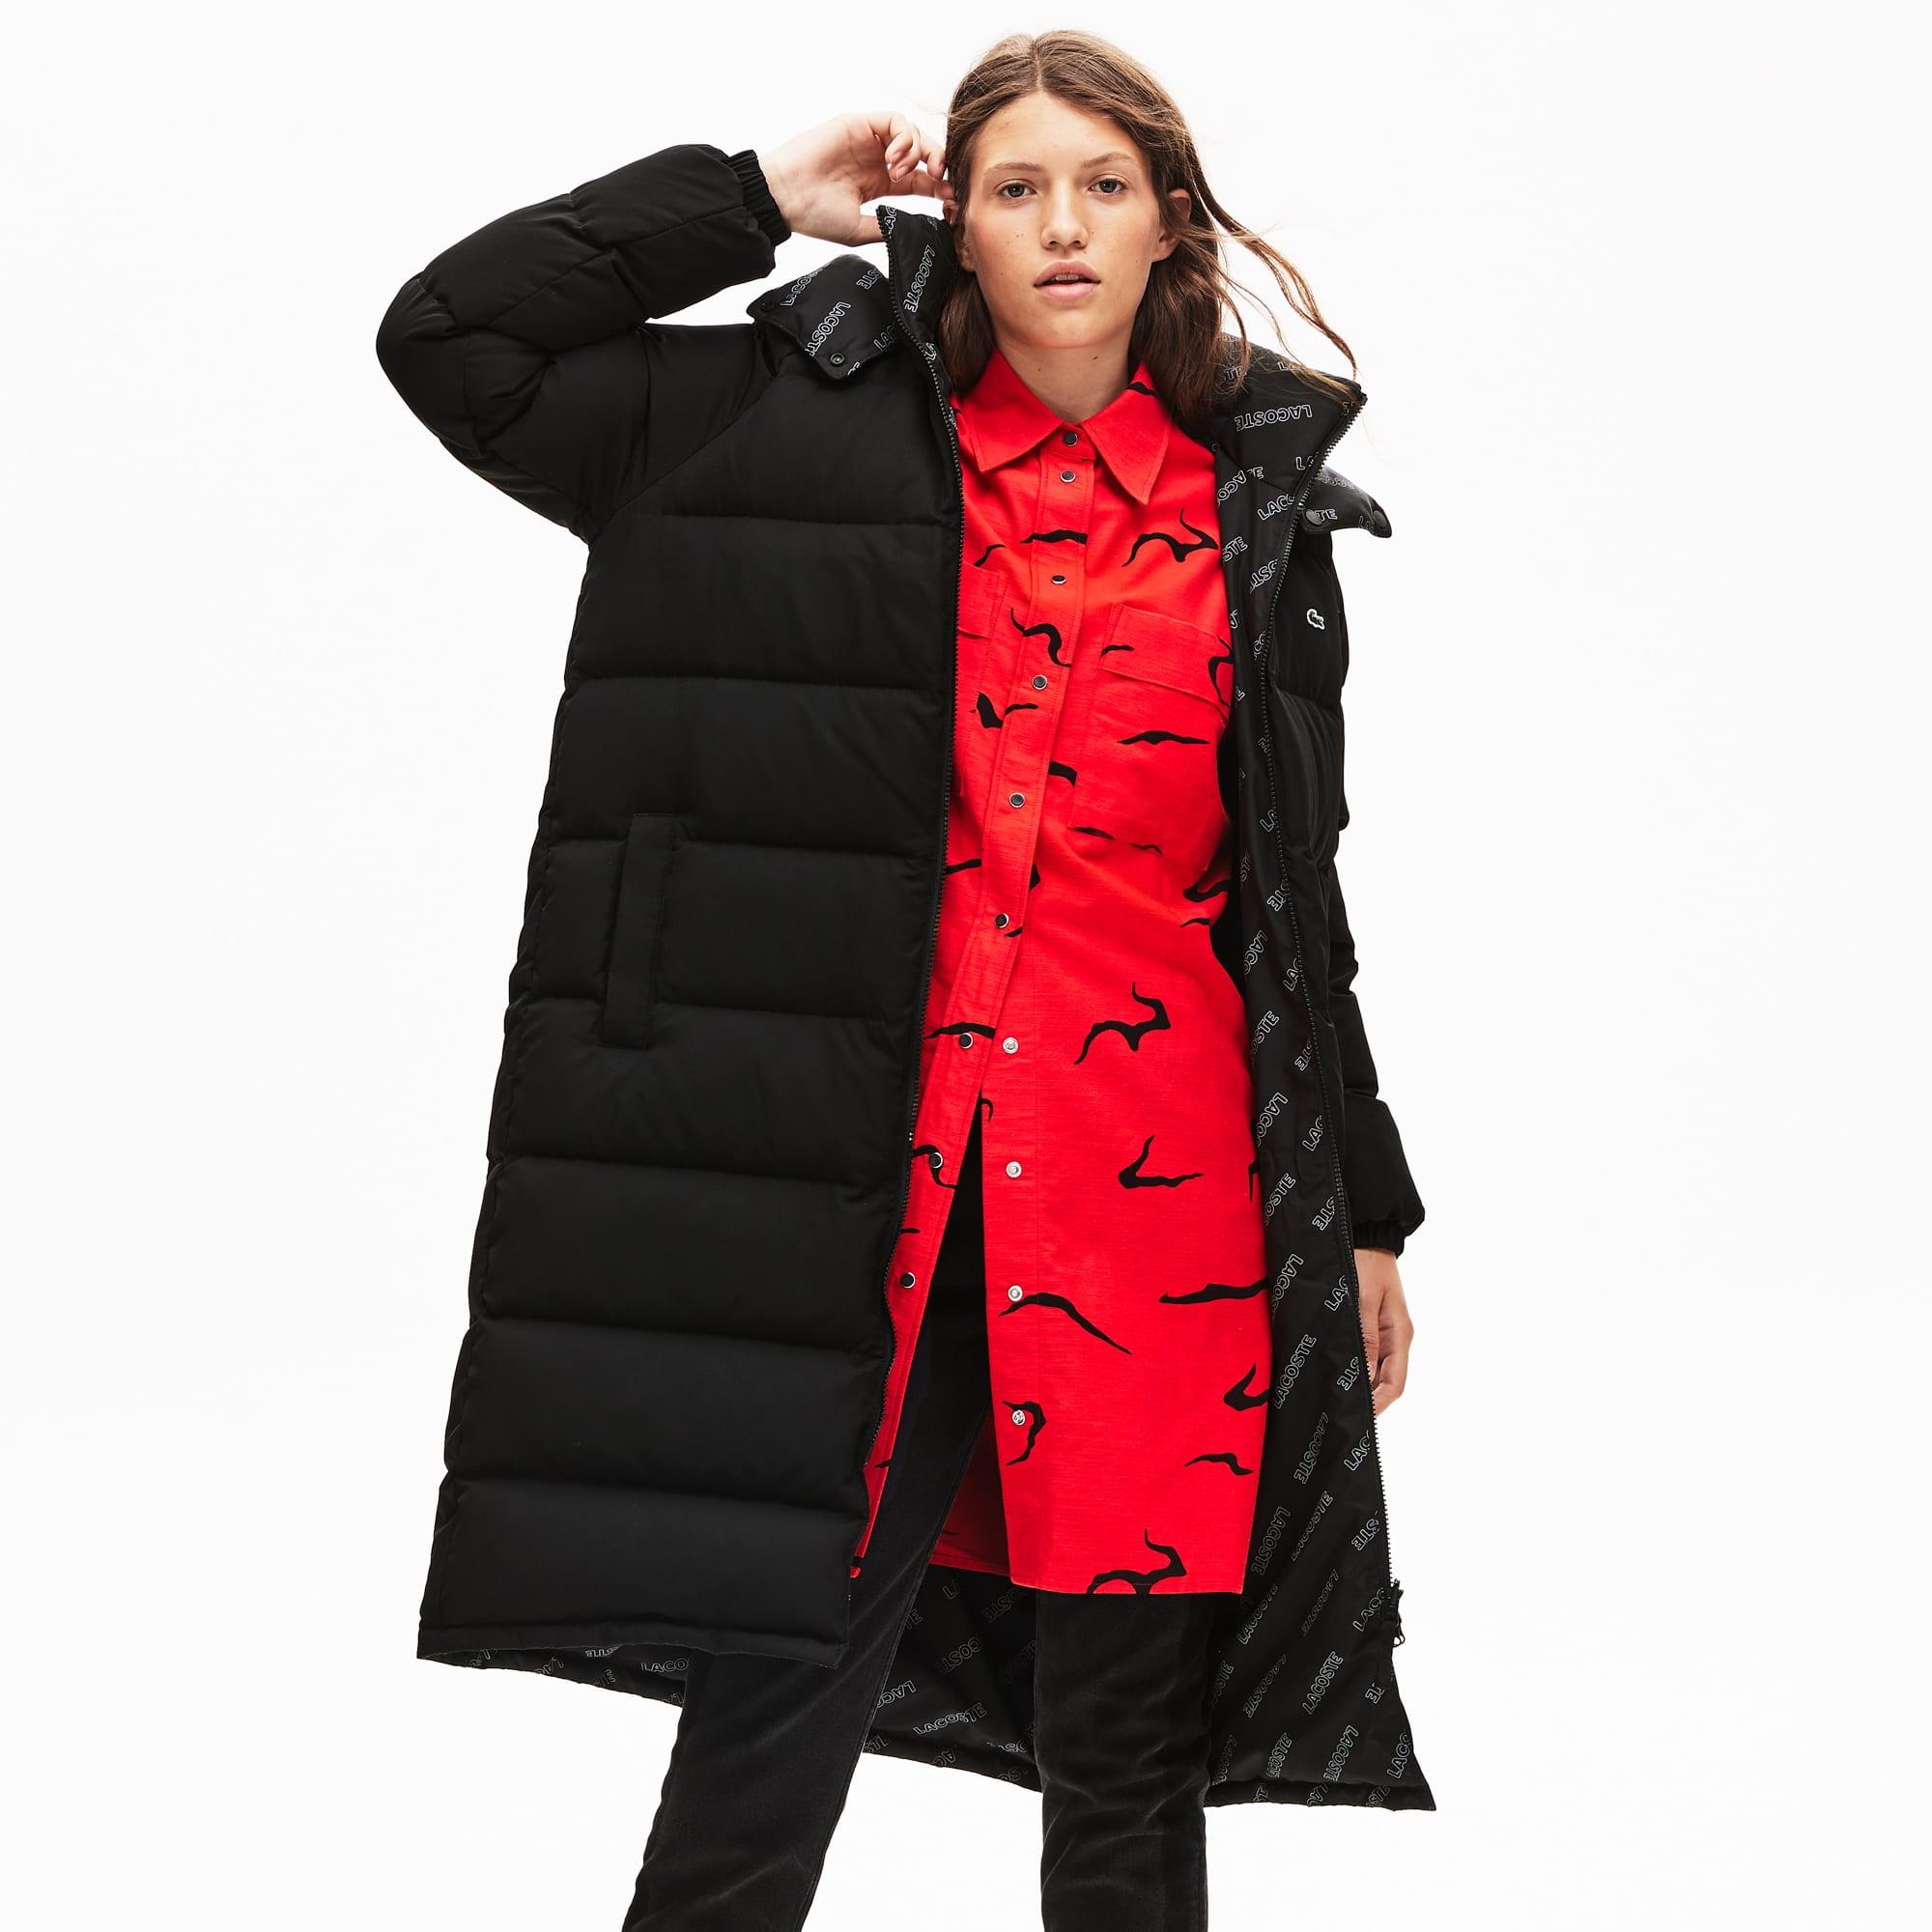 fdaa8d73 Jackets and Coats | Women's Outerwear | LACOSTE